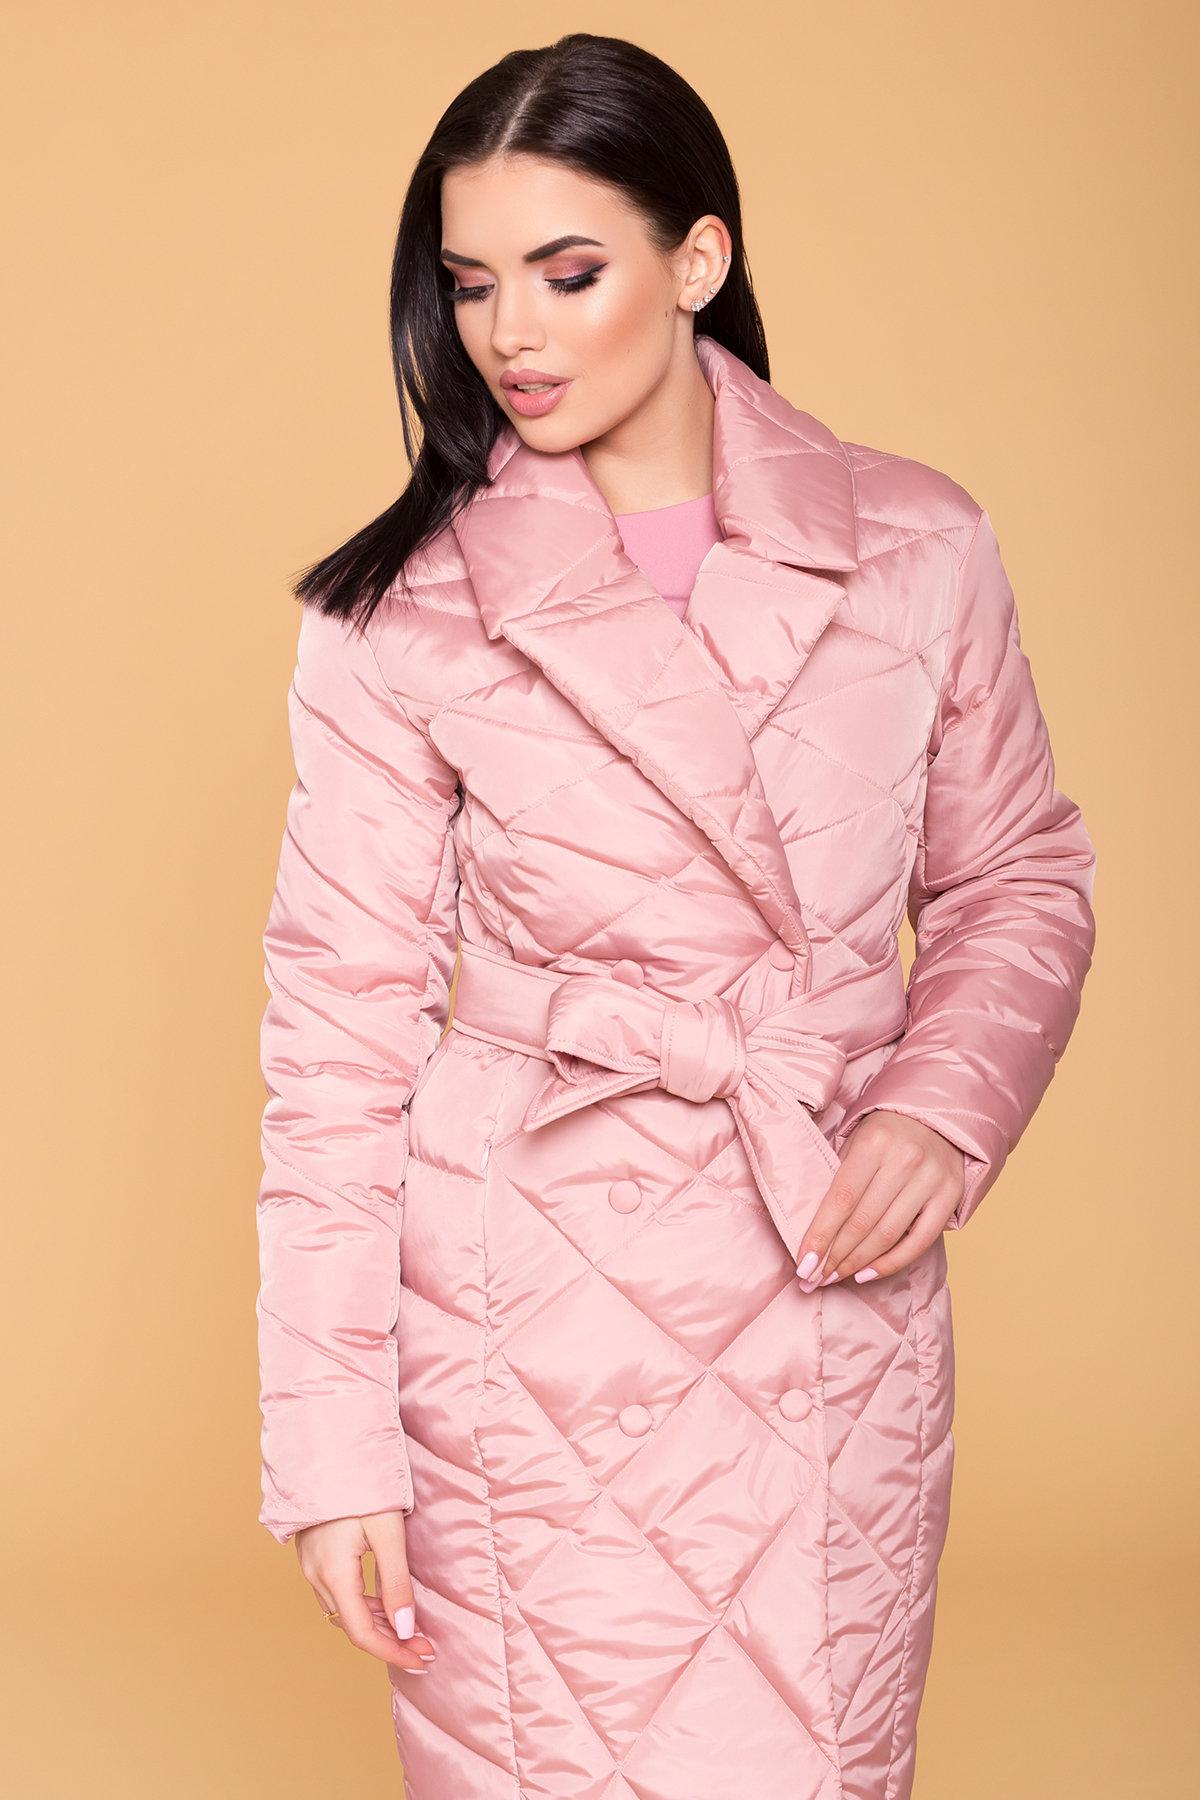 Пальто Сандра 6422 АРТ. 41356 Цвет: Пудра - фото 5, интернет магазин tm-modus.ru